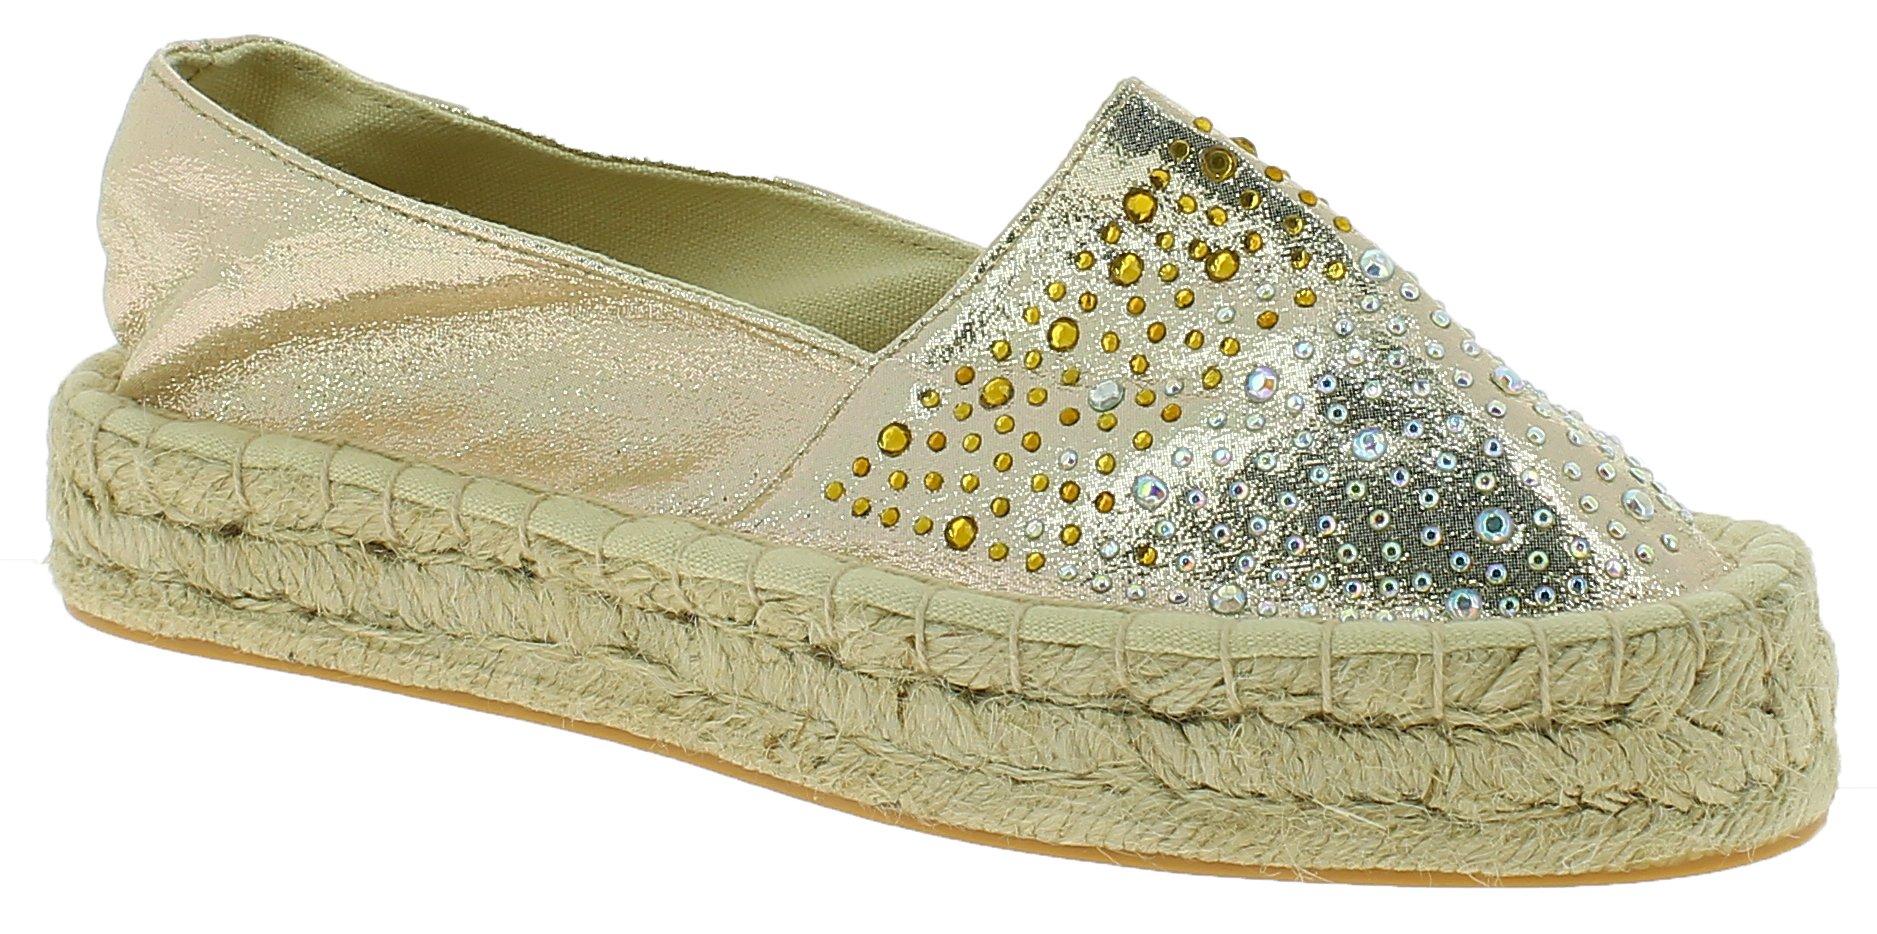 POMPEA Γυναικείο Casual LITA 215 Χρυσό - IqShoes - LITA 215 GOLD-gold-36/1/34/7 παπούτσια  προσφορεσ